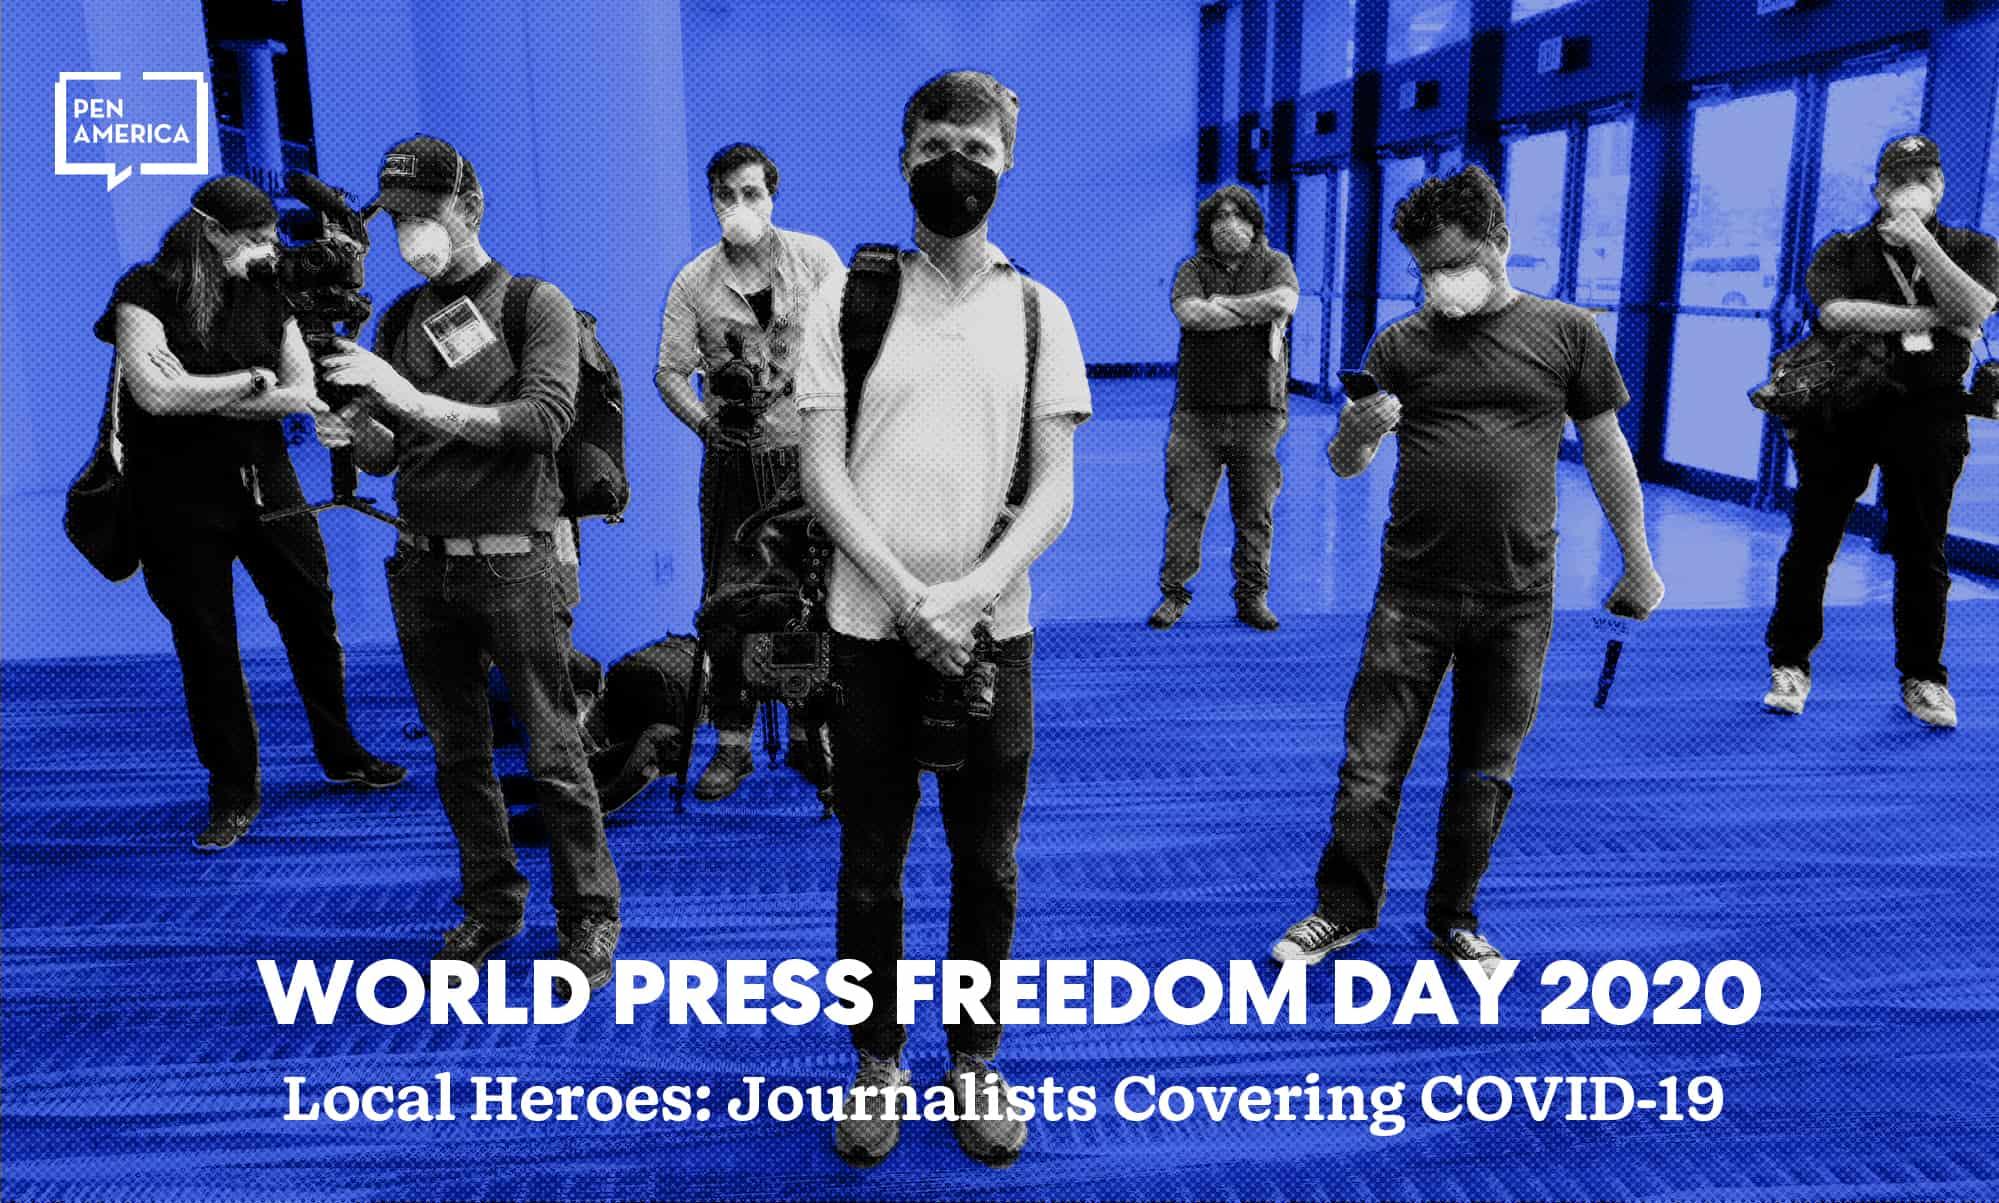 WorldPressFreedomDay2020 Header